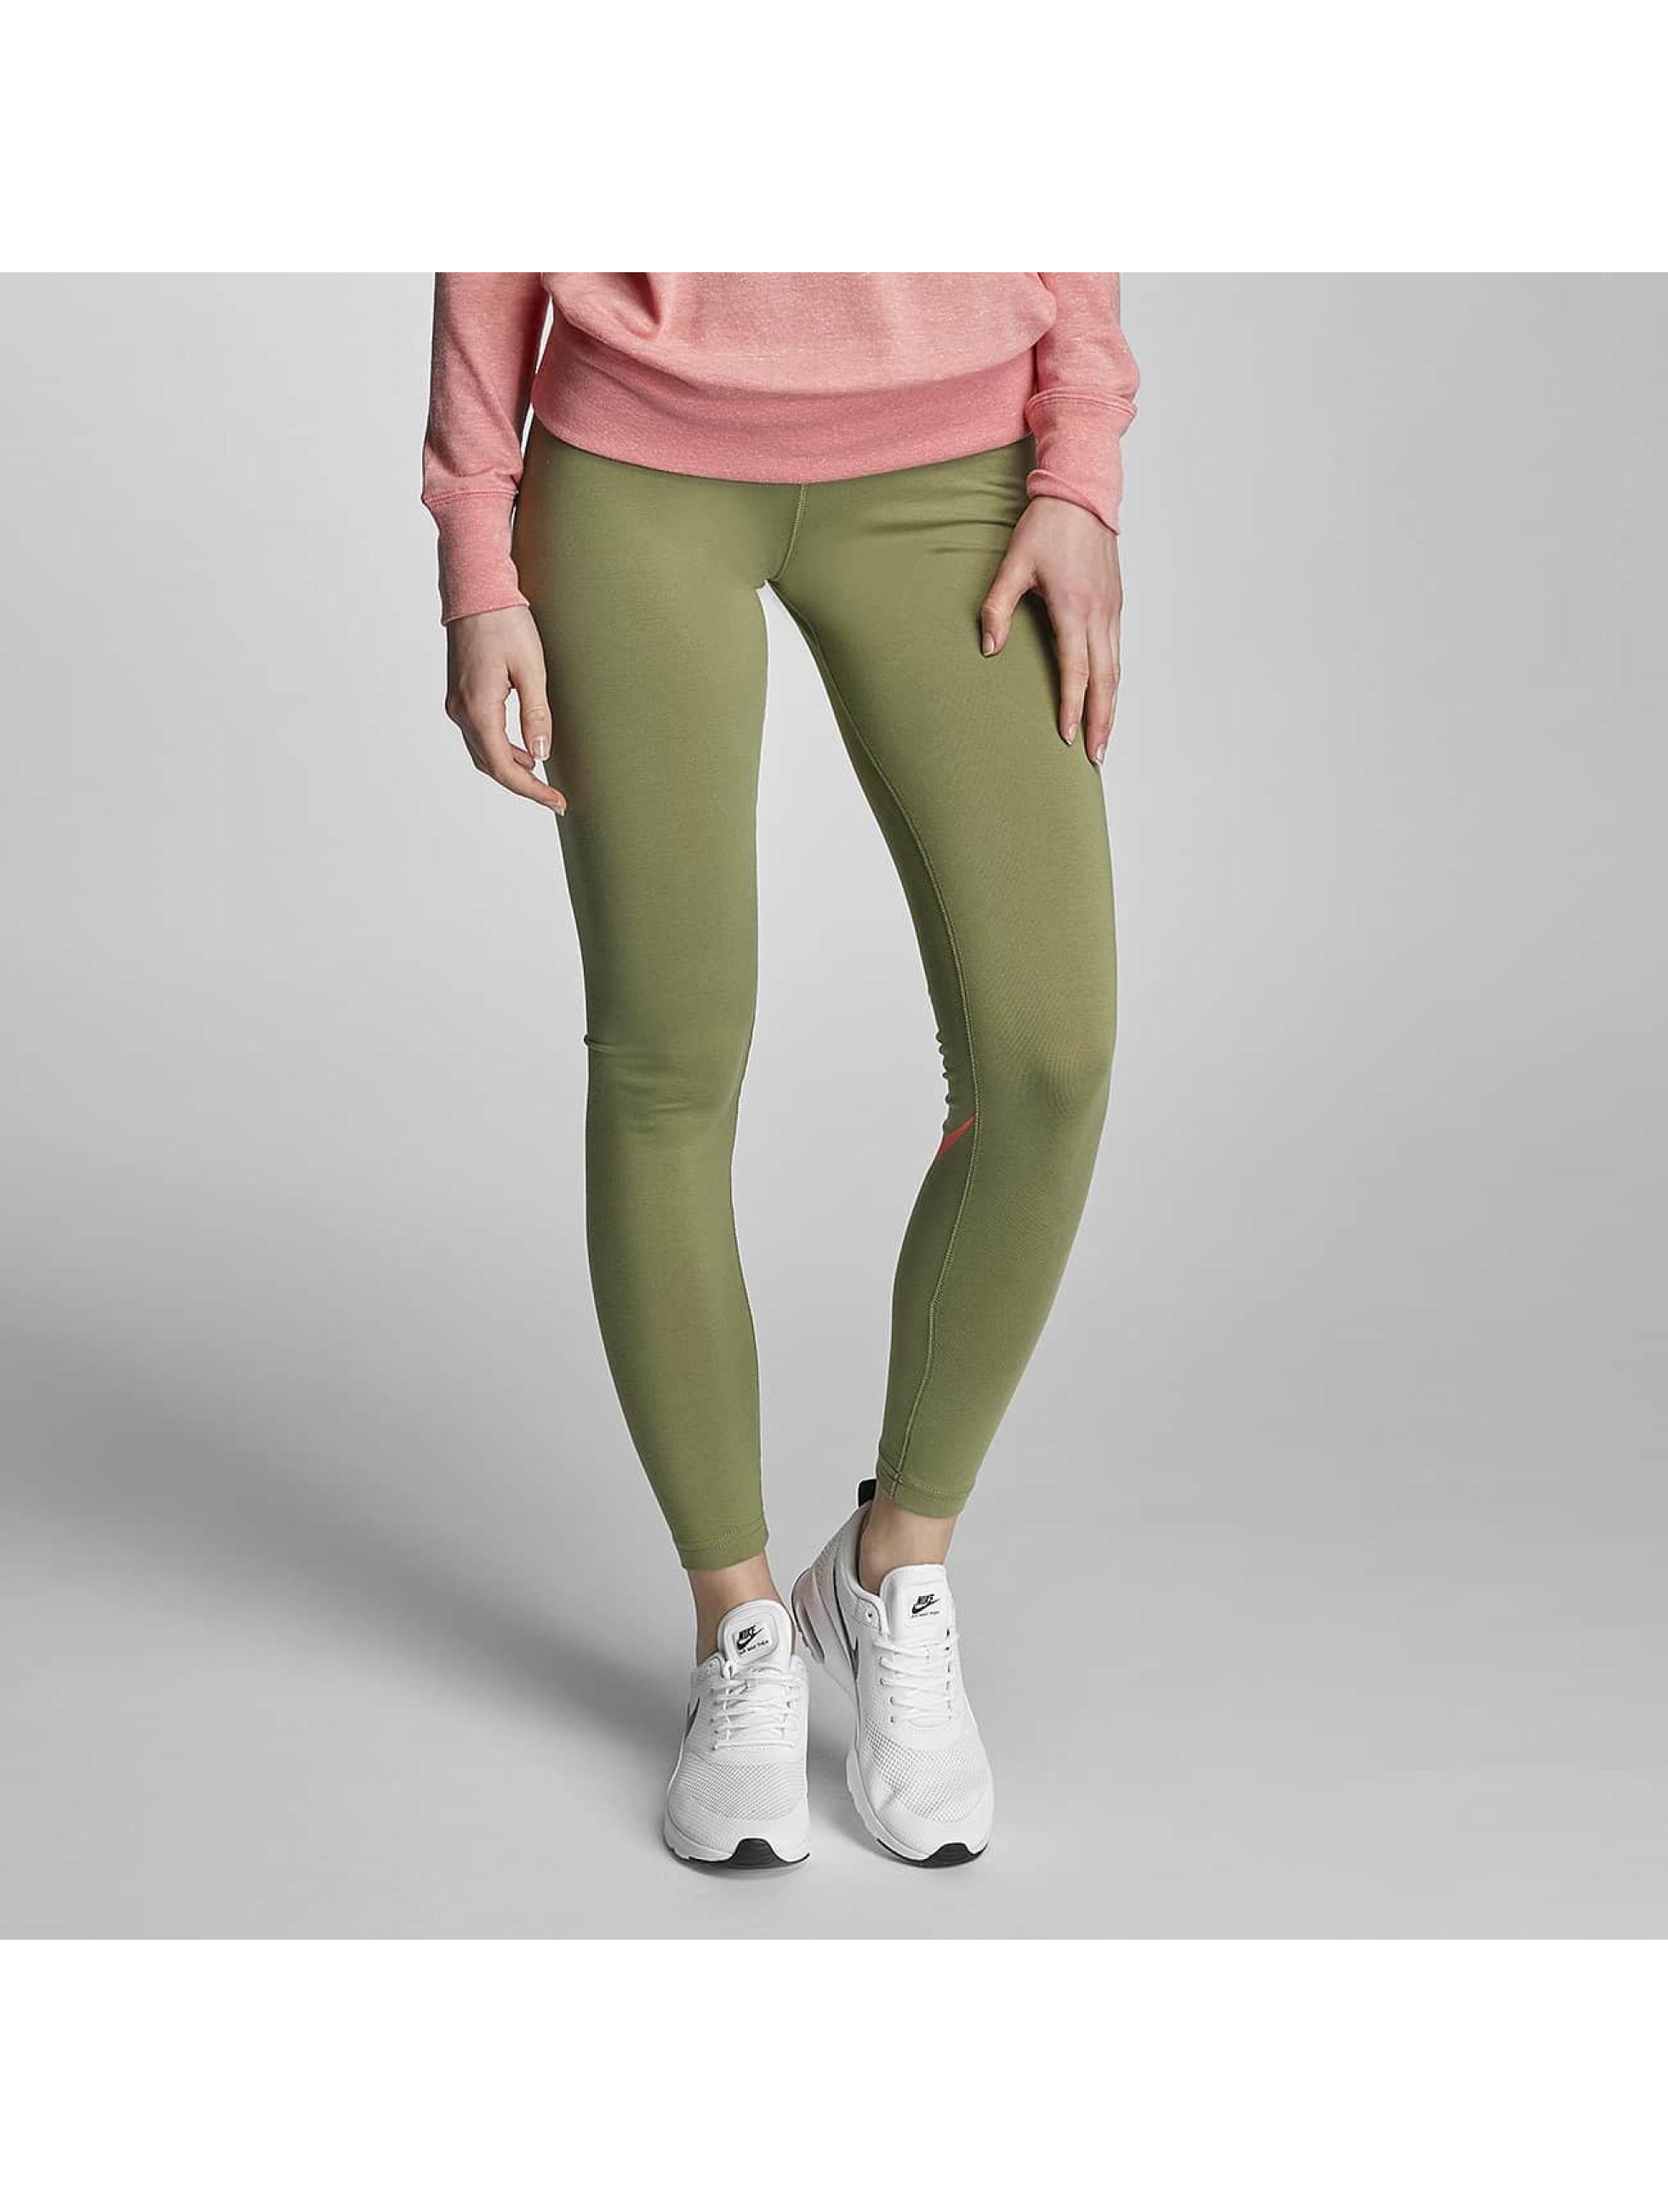 Nike Frauen Legging Leg-A-See Logo in olive